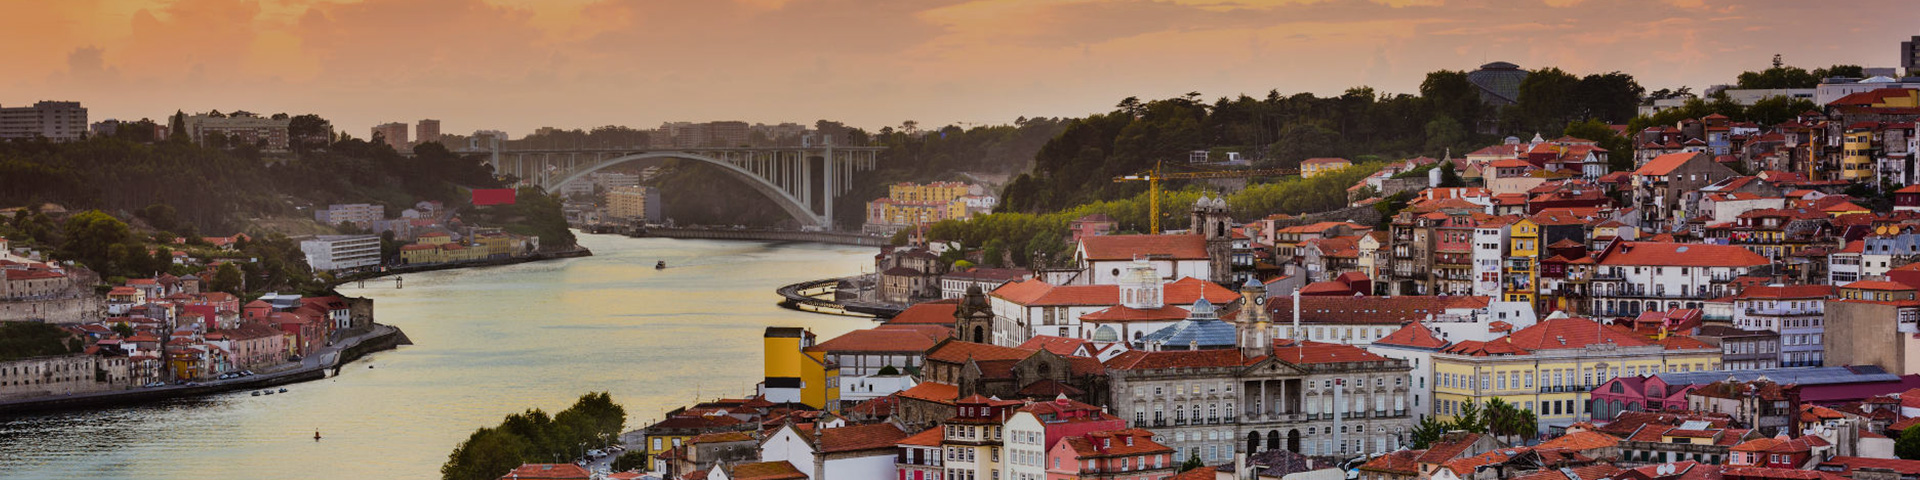 Porto hero drk